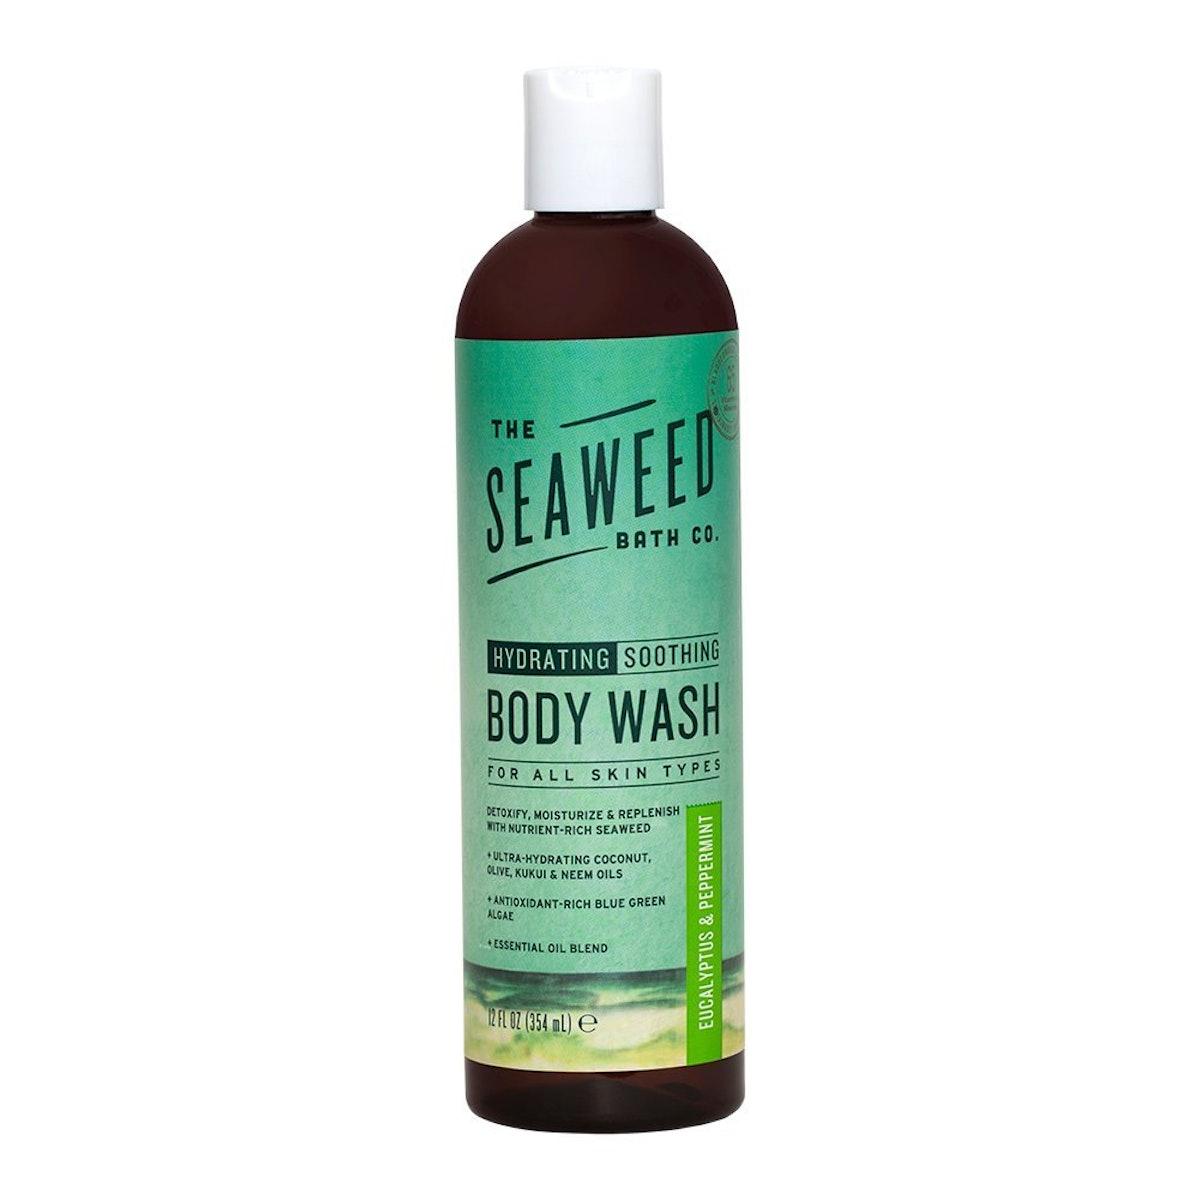 The Seaweed Bath Co Body Wash